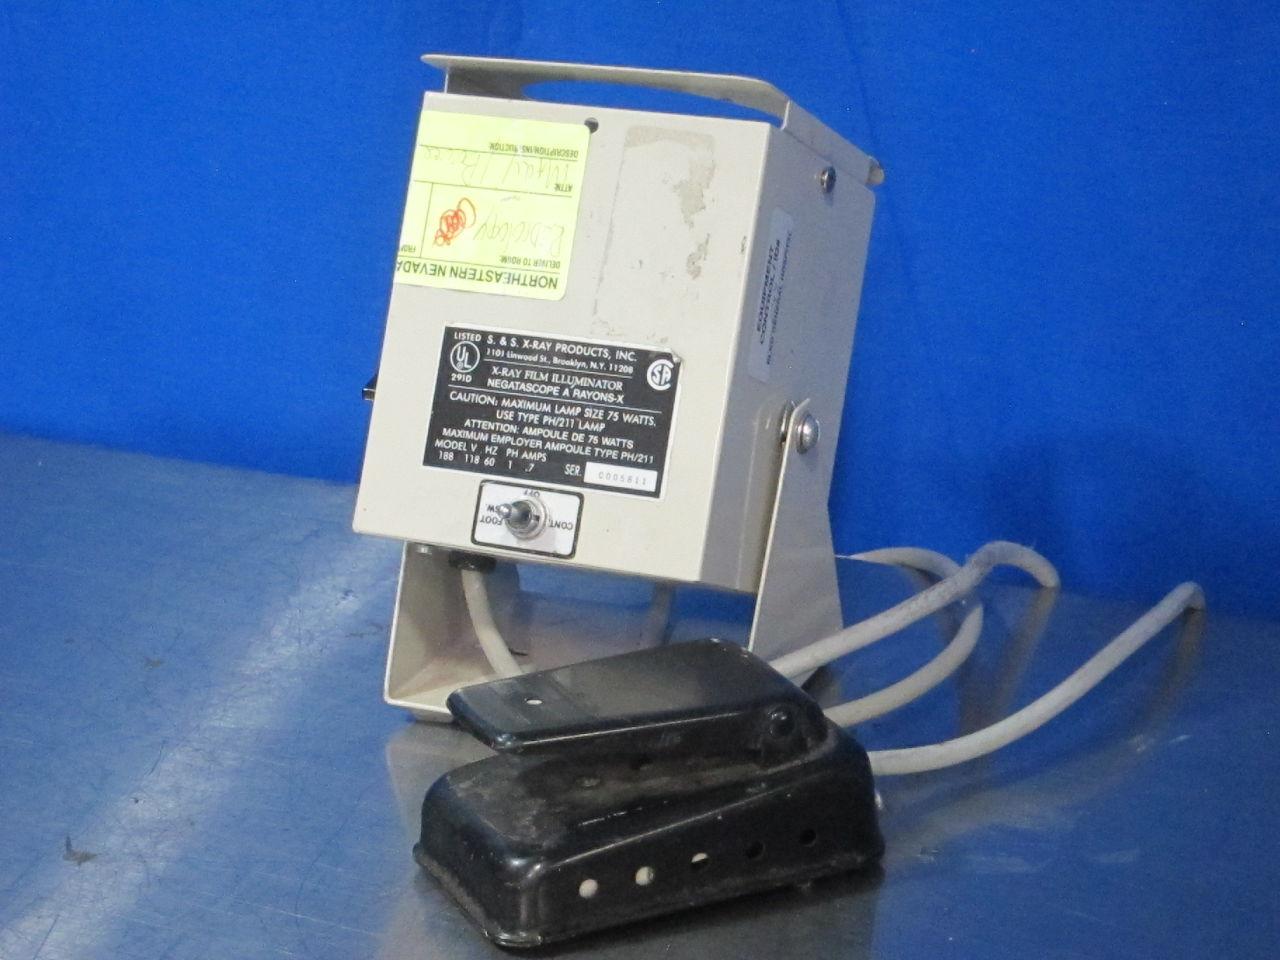 S&S X-RAY PRODUCTS 188 Film Illuminator